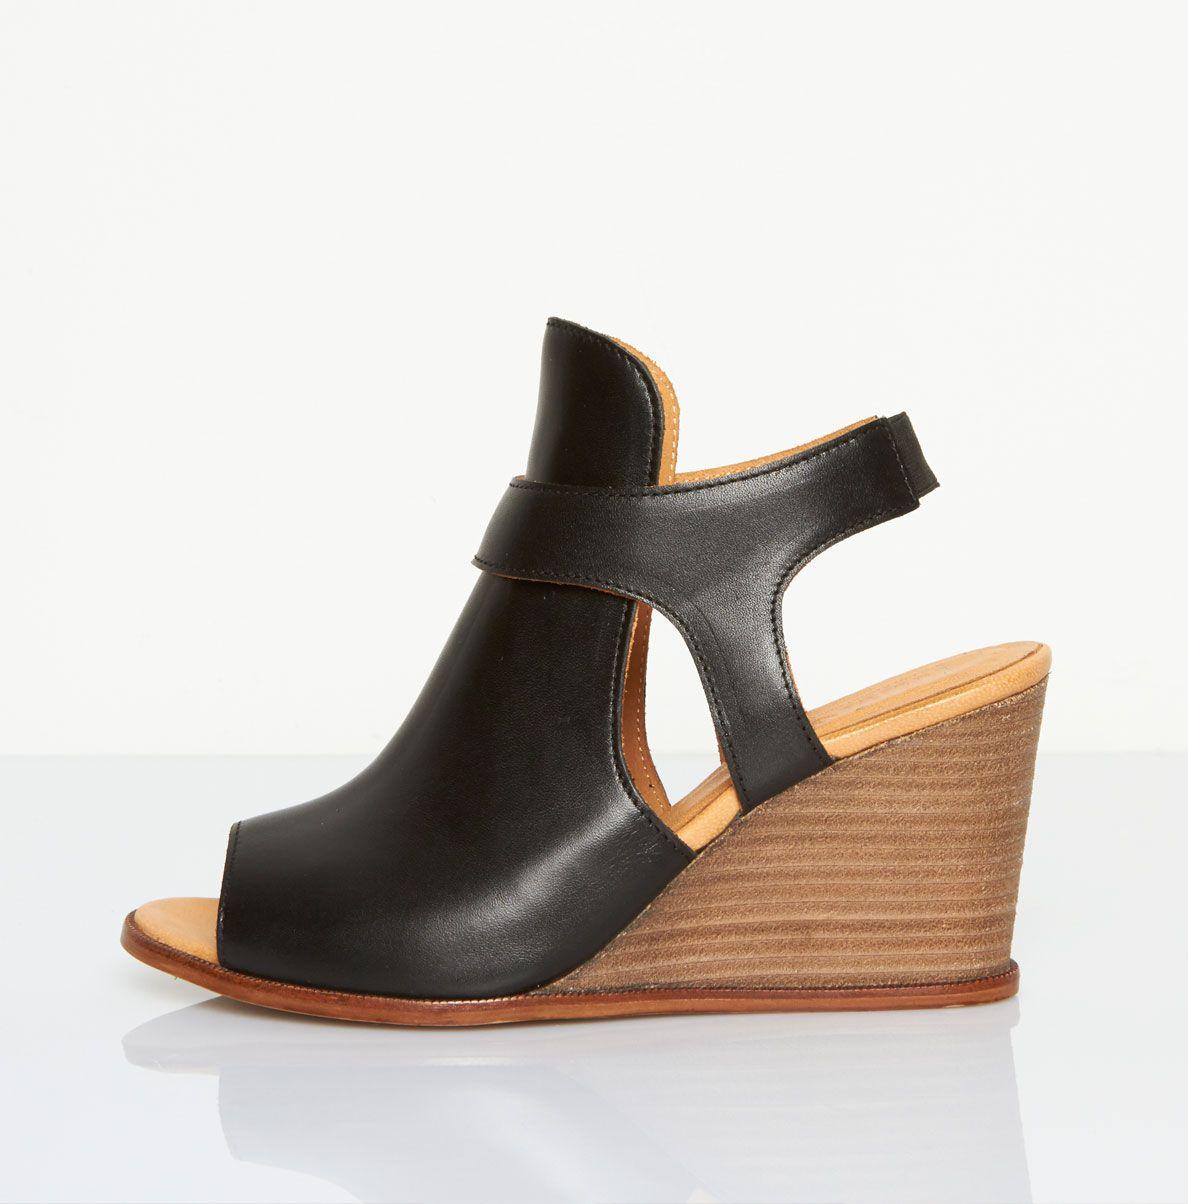 Maison Margiela Cutout Wedge Heel In Black Lyst Wedge Heels Wedges Black Heels Wedges